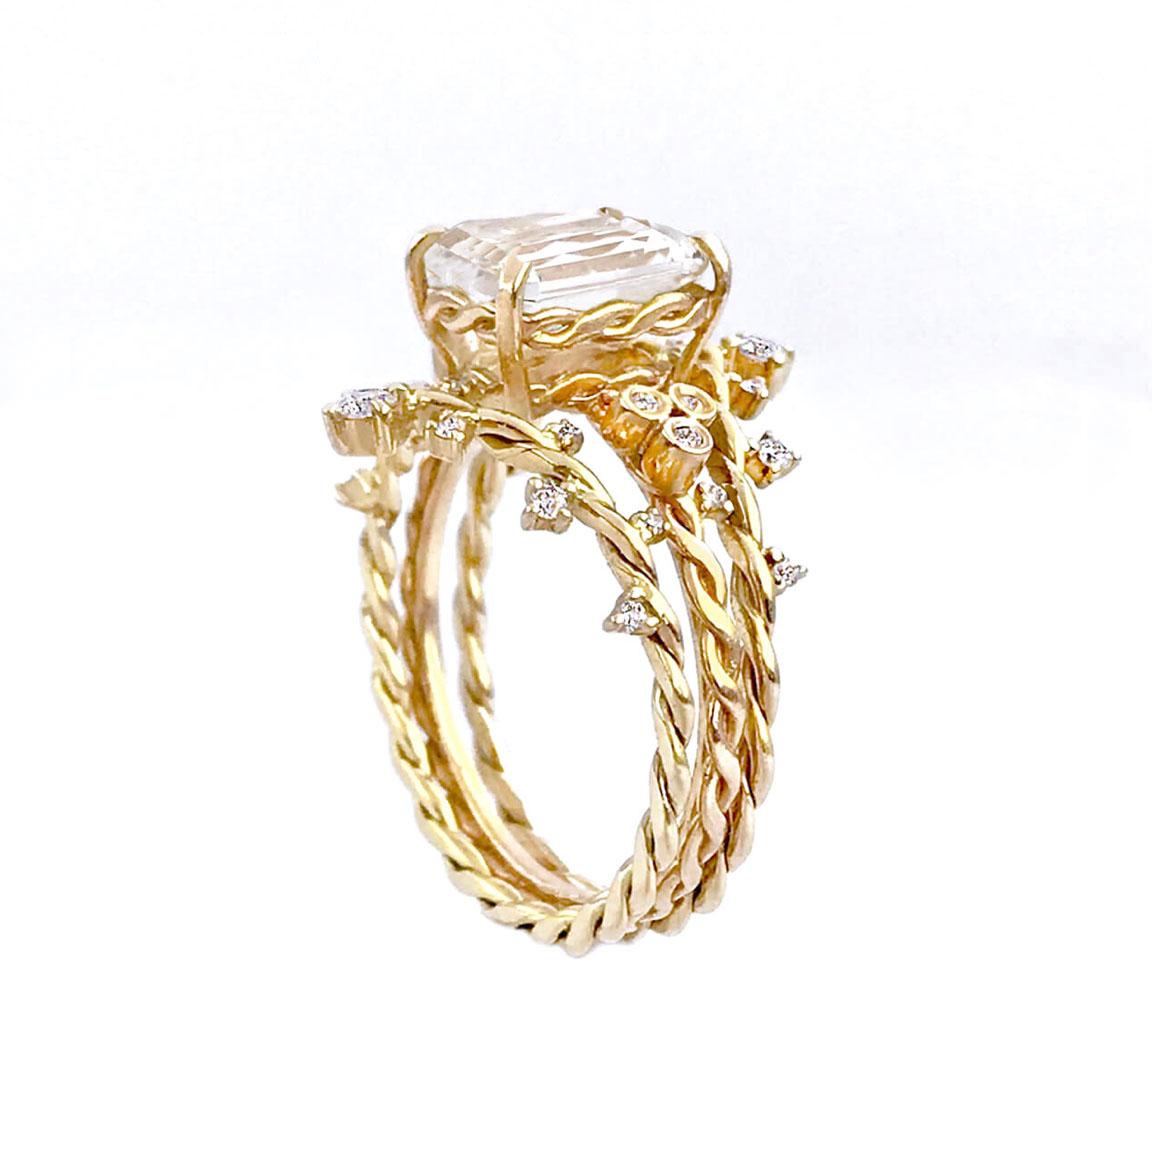 emerald-cut-Clear-qurtz-diamond-solitaire-twiat-stacking-set-14k-18k-C-jewelyrie